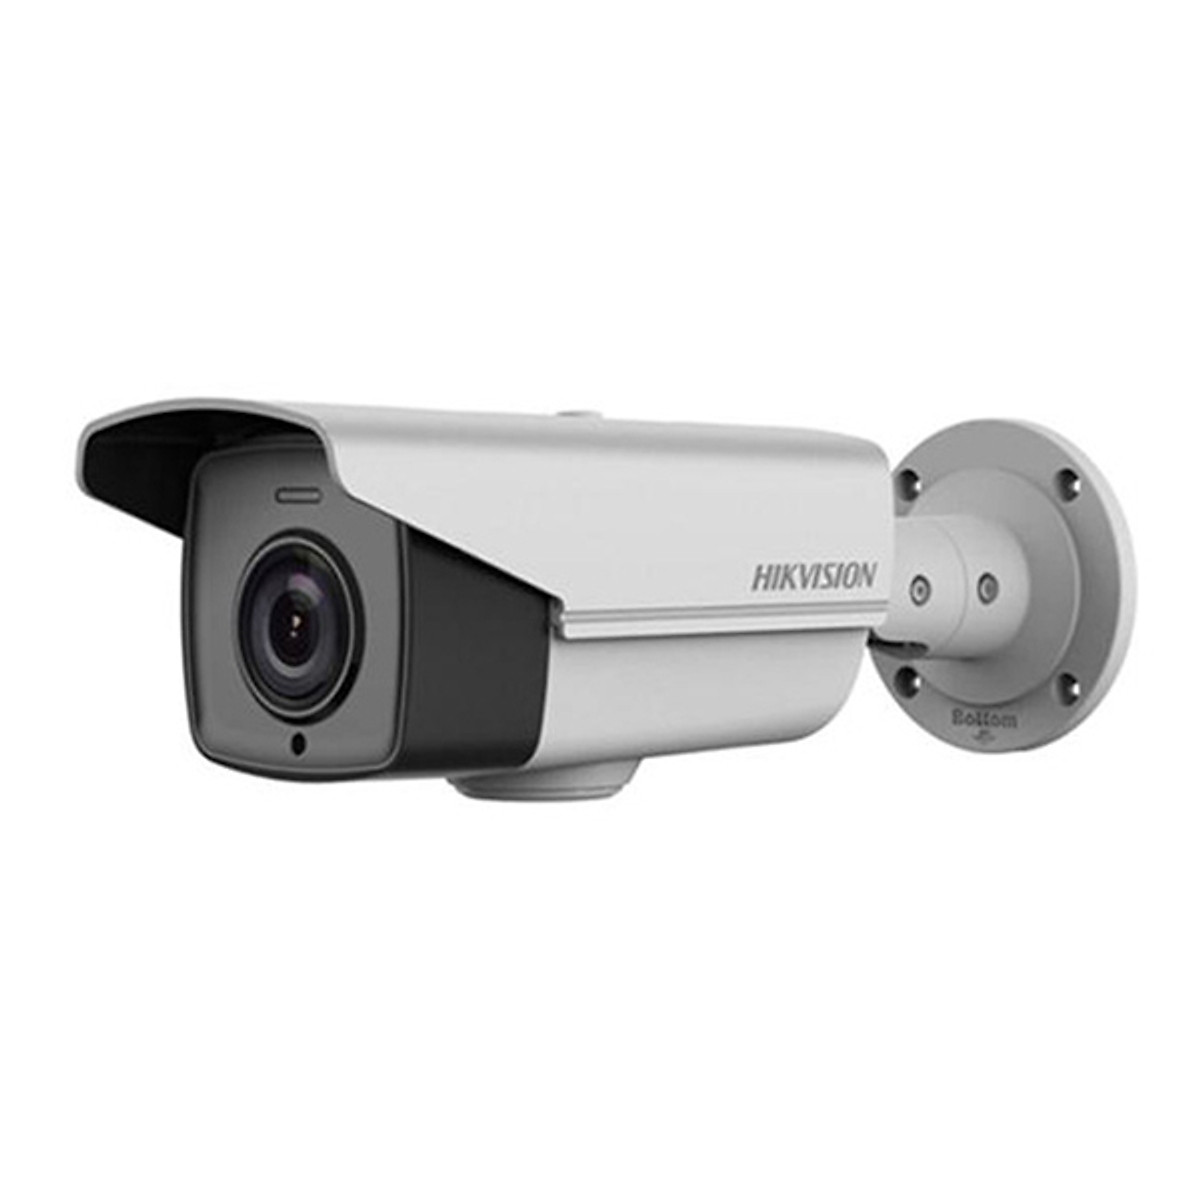 Camera HIKVISION DS-2CE16D9T-AIRAZH 2.0 Megapixel - Hàng Nhập Khẩu